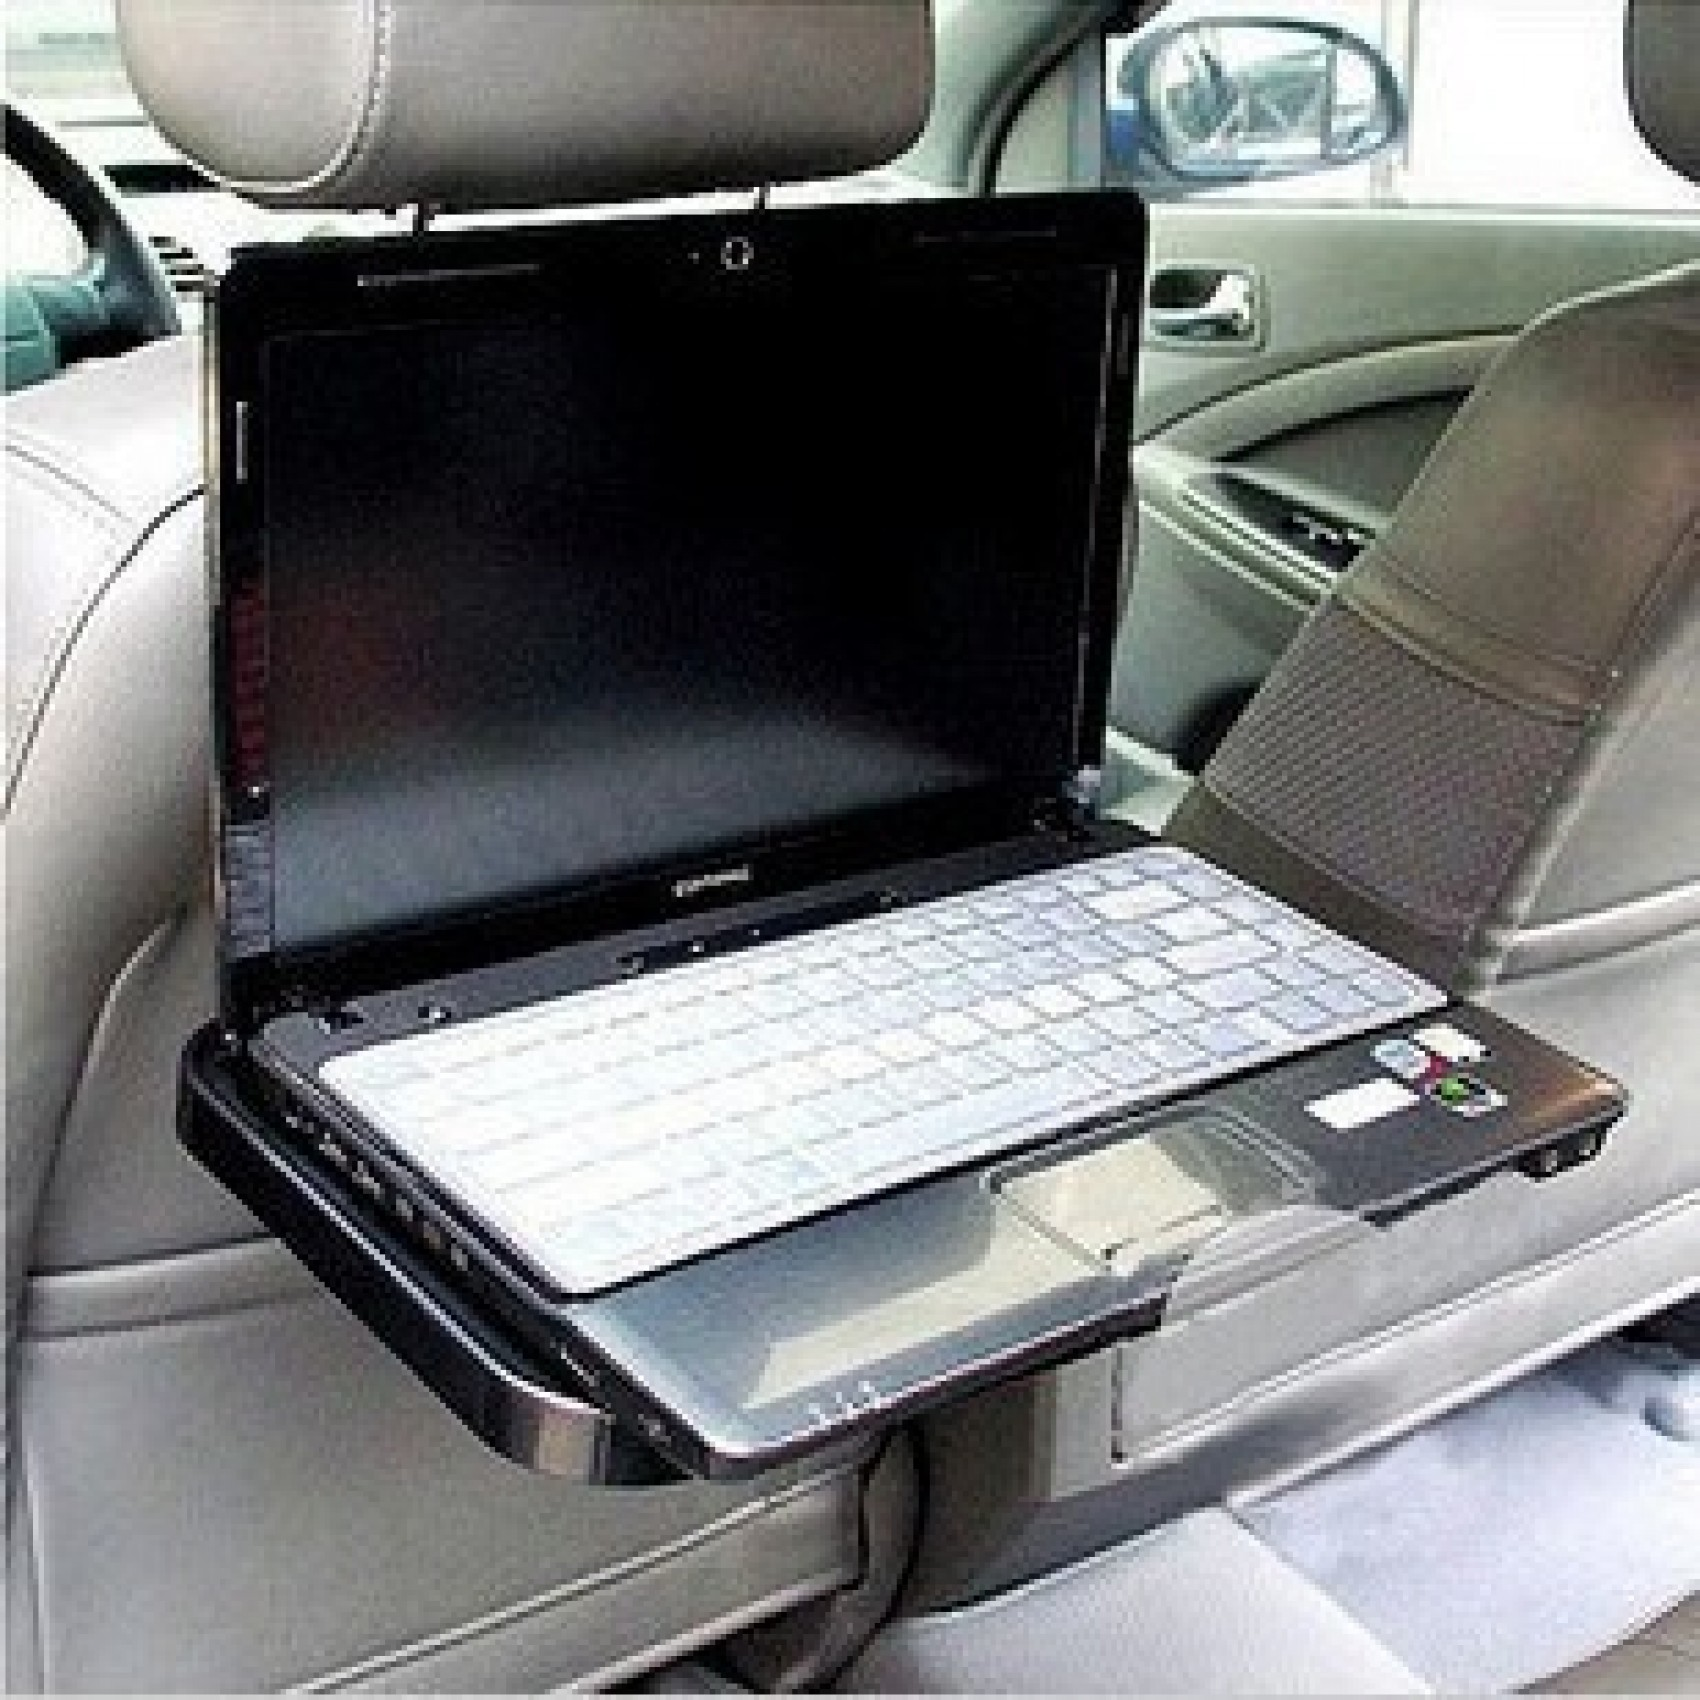 car back seat desk for laptop for sale online at up to 50 off